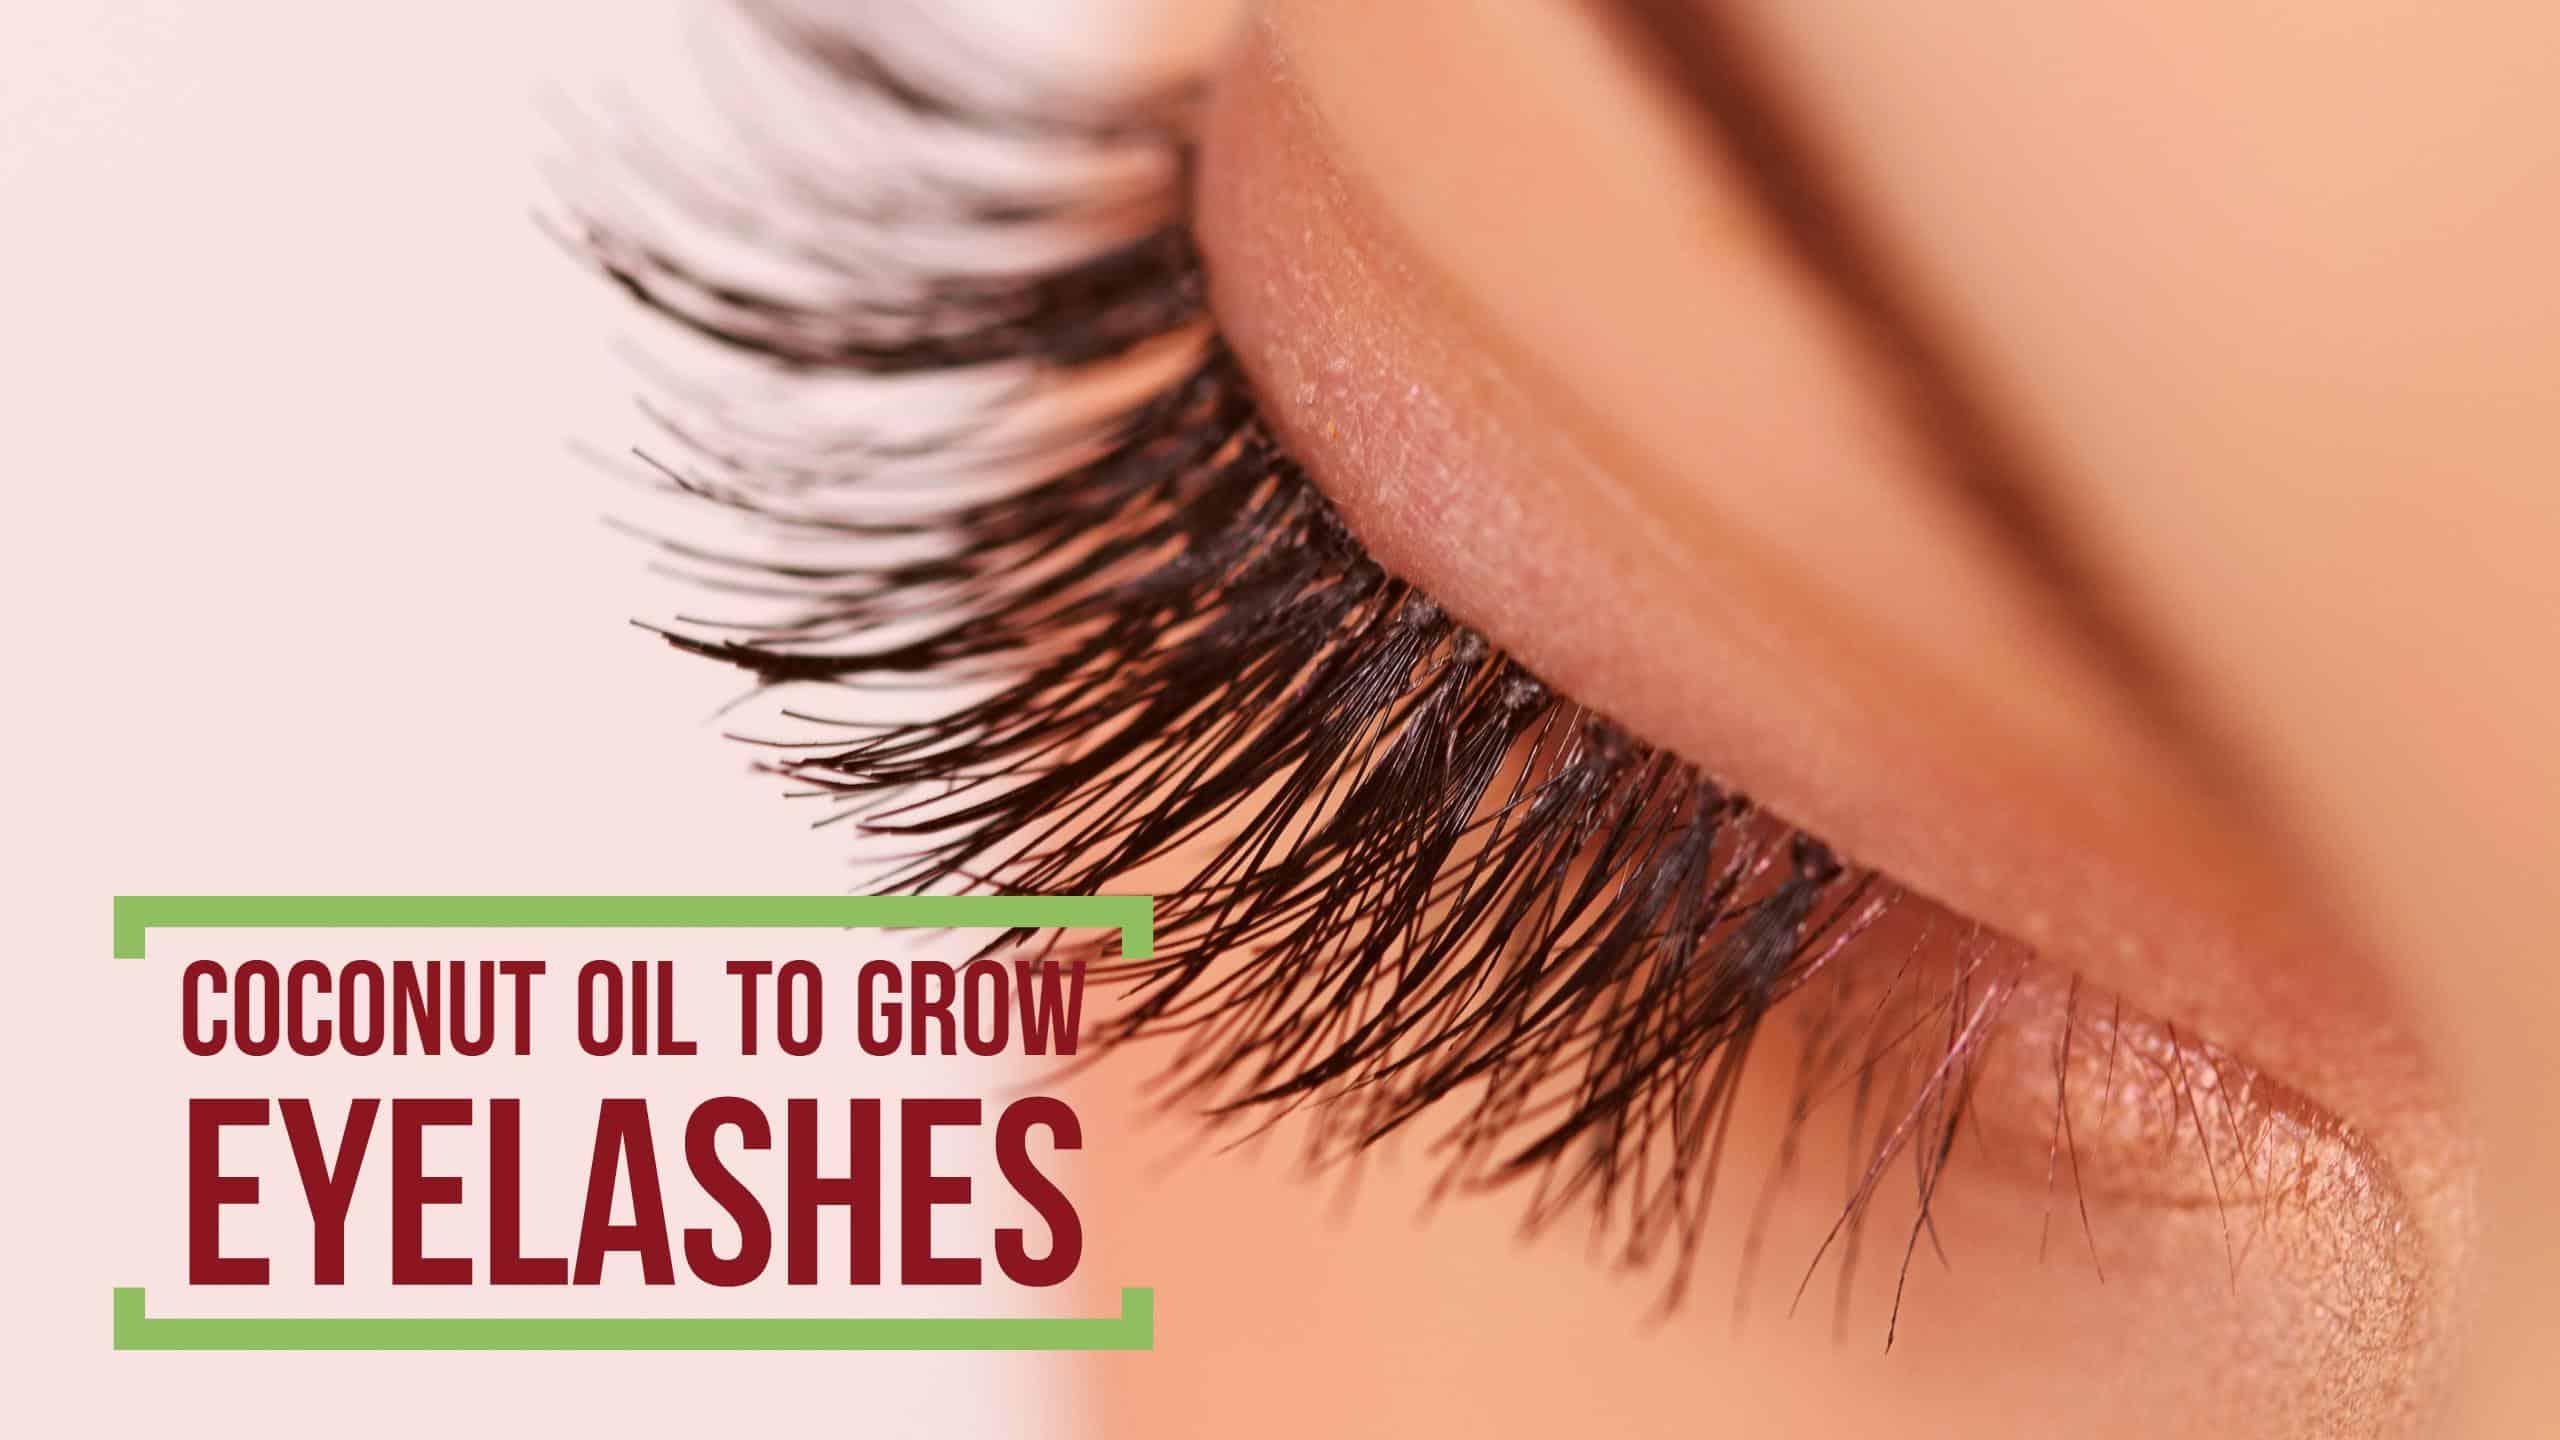 Coconut oil for eyelashes yahoo dating 6